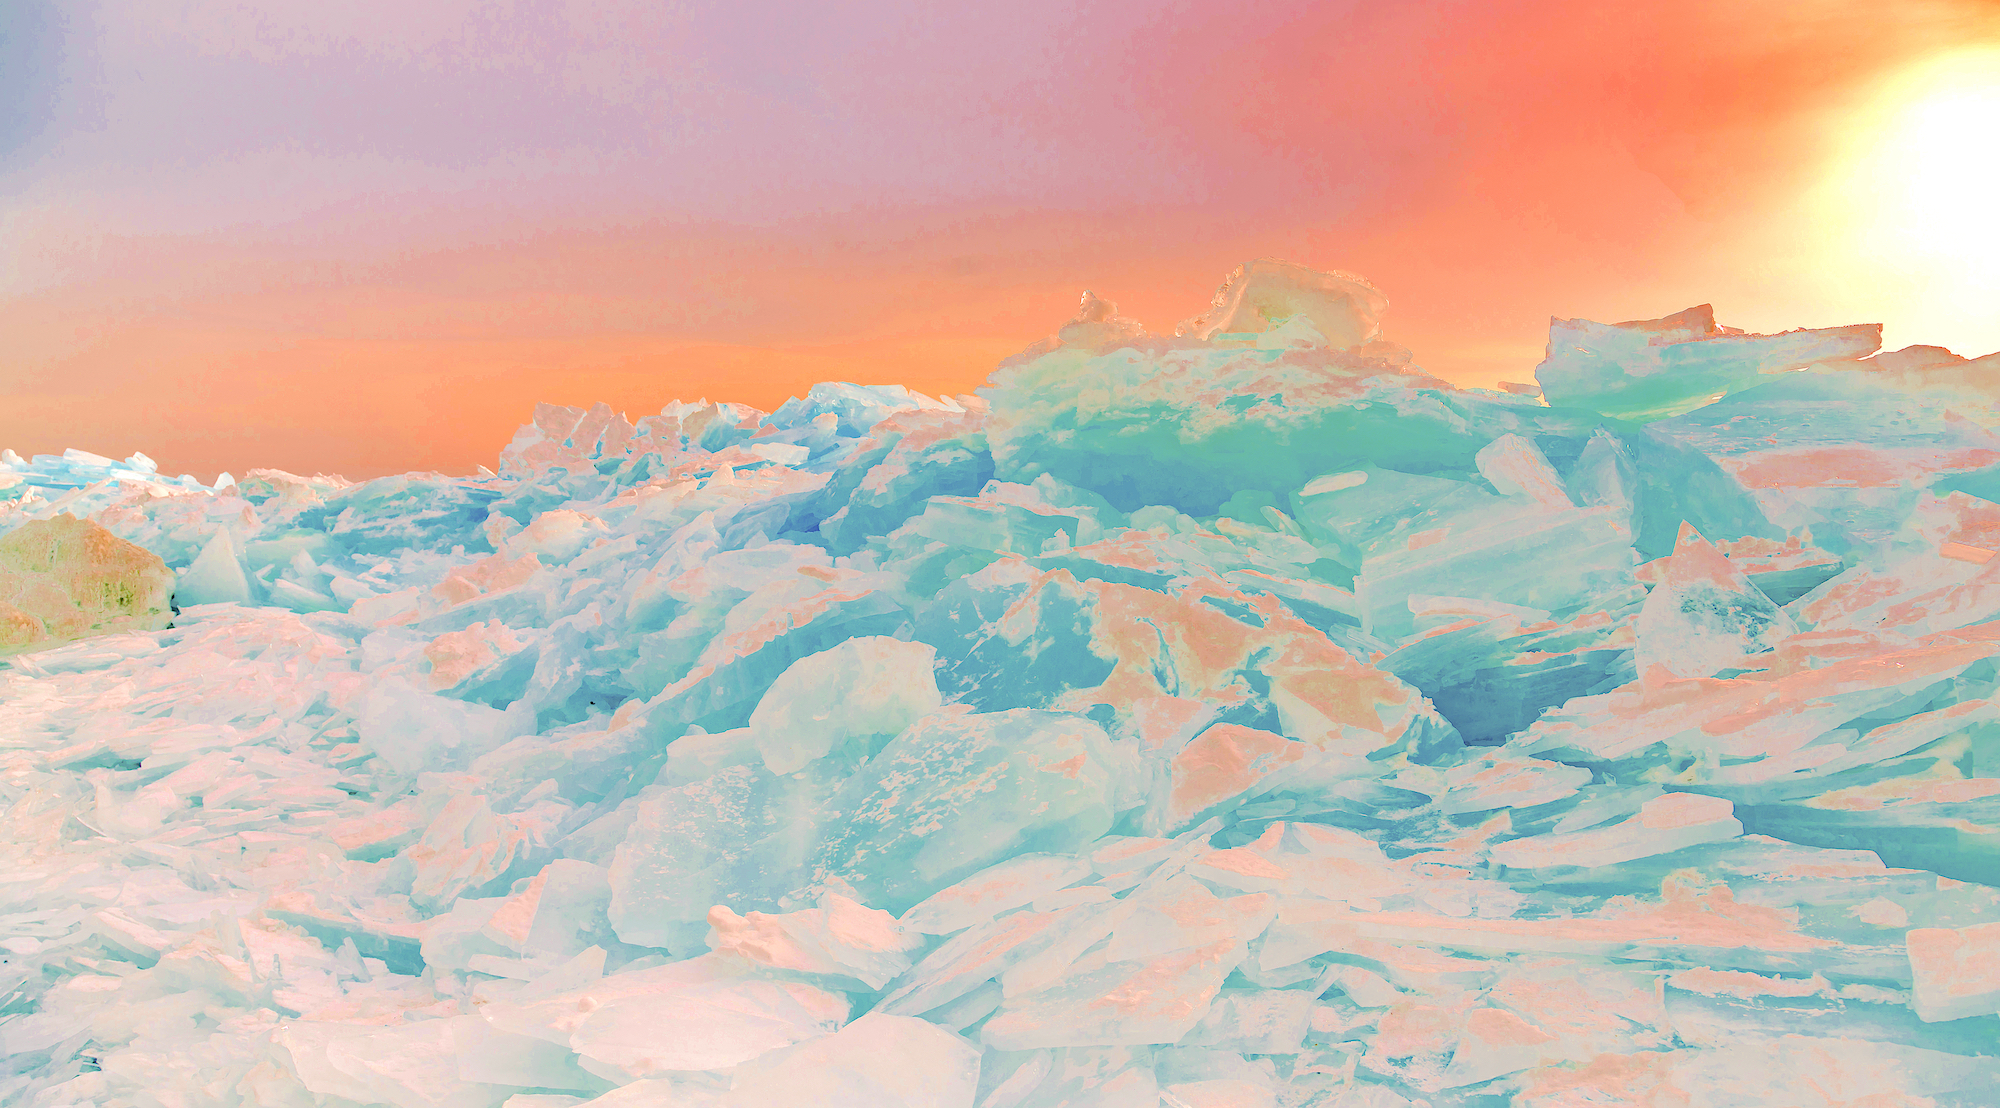 Beneath the Cryosphere / Part VIII,  2019 Aquarelle, wax pastels, UV-print on mirror beneath structured Plexiglas 190 x 120 cm (75 x 47 in)